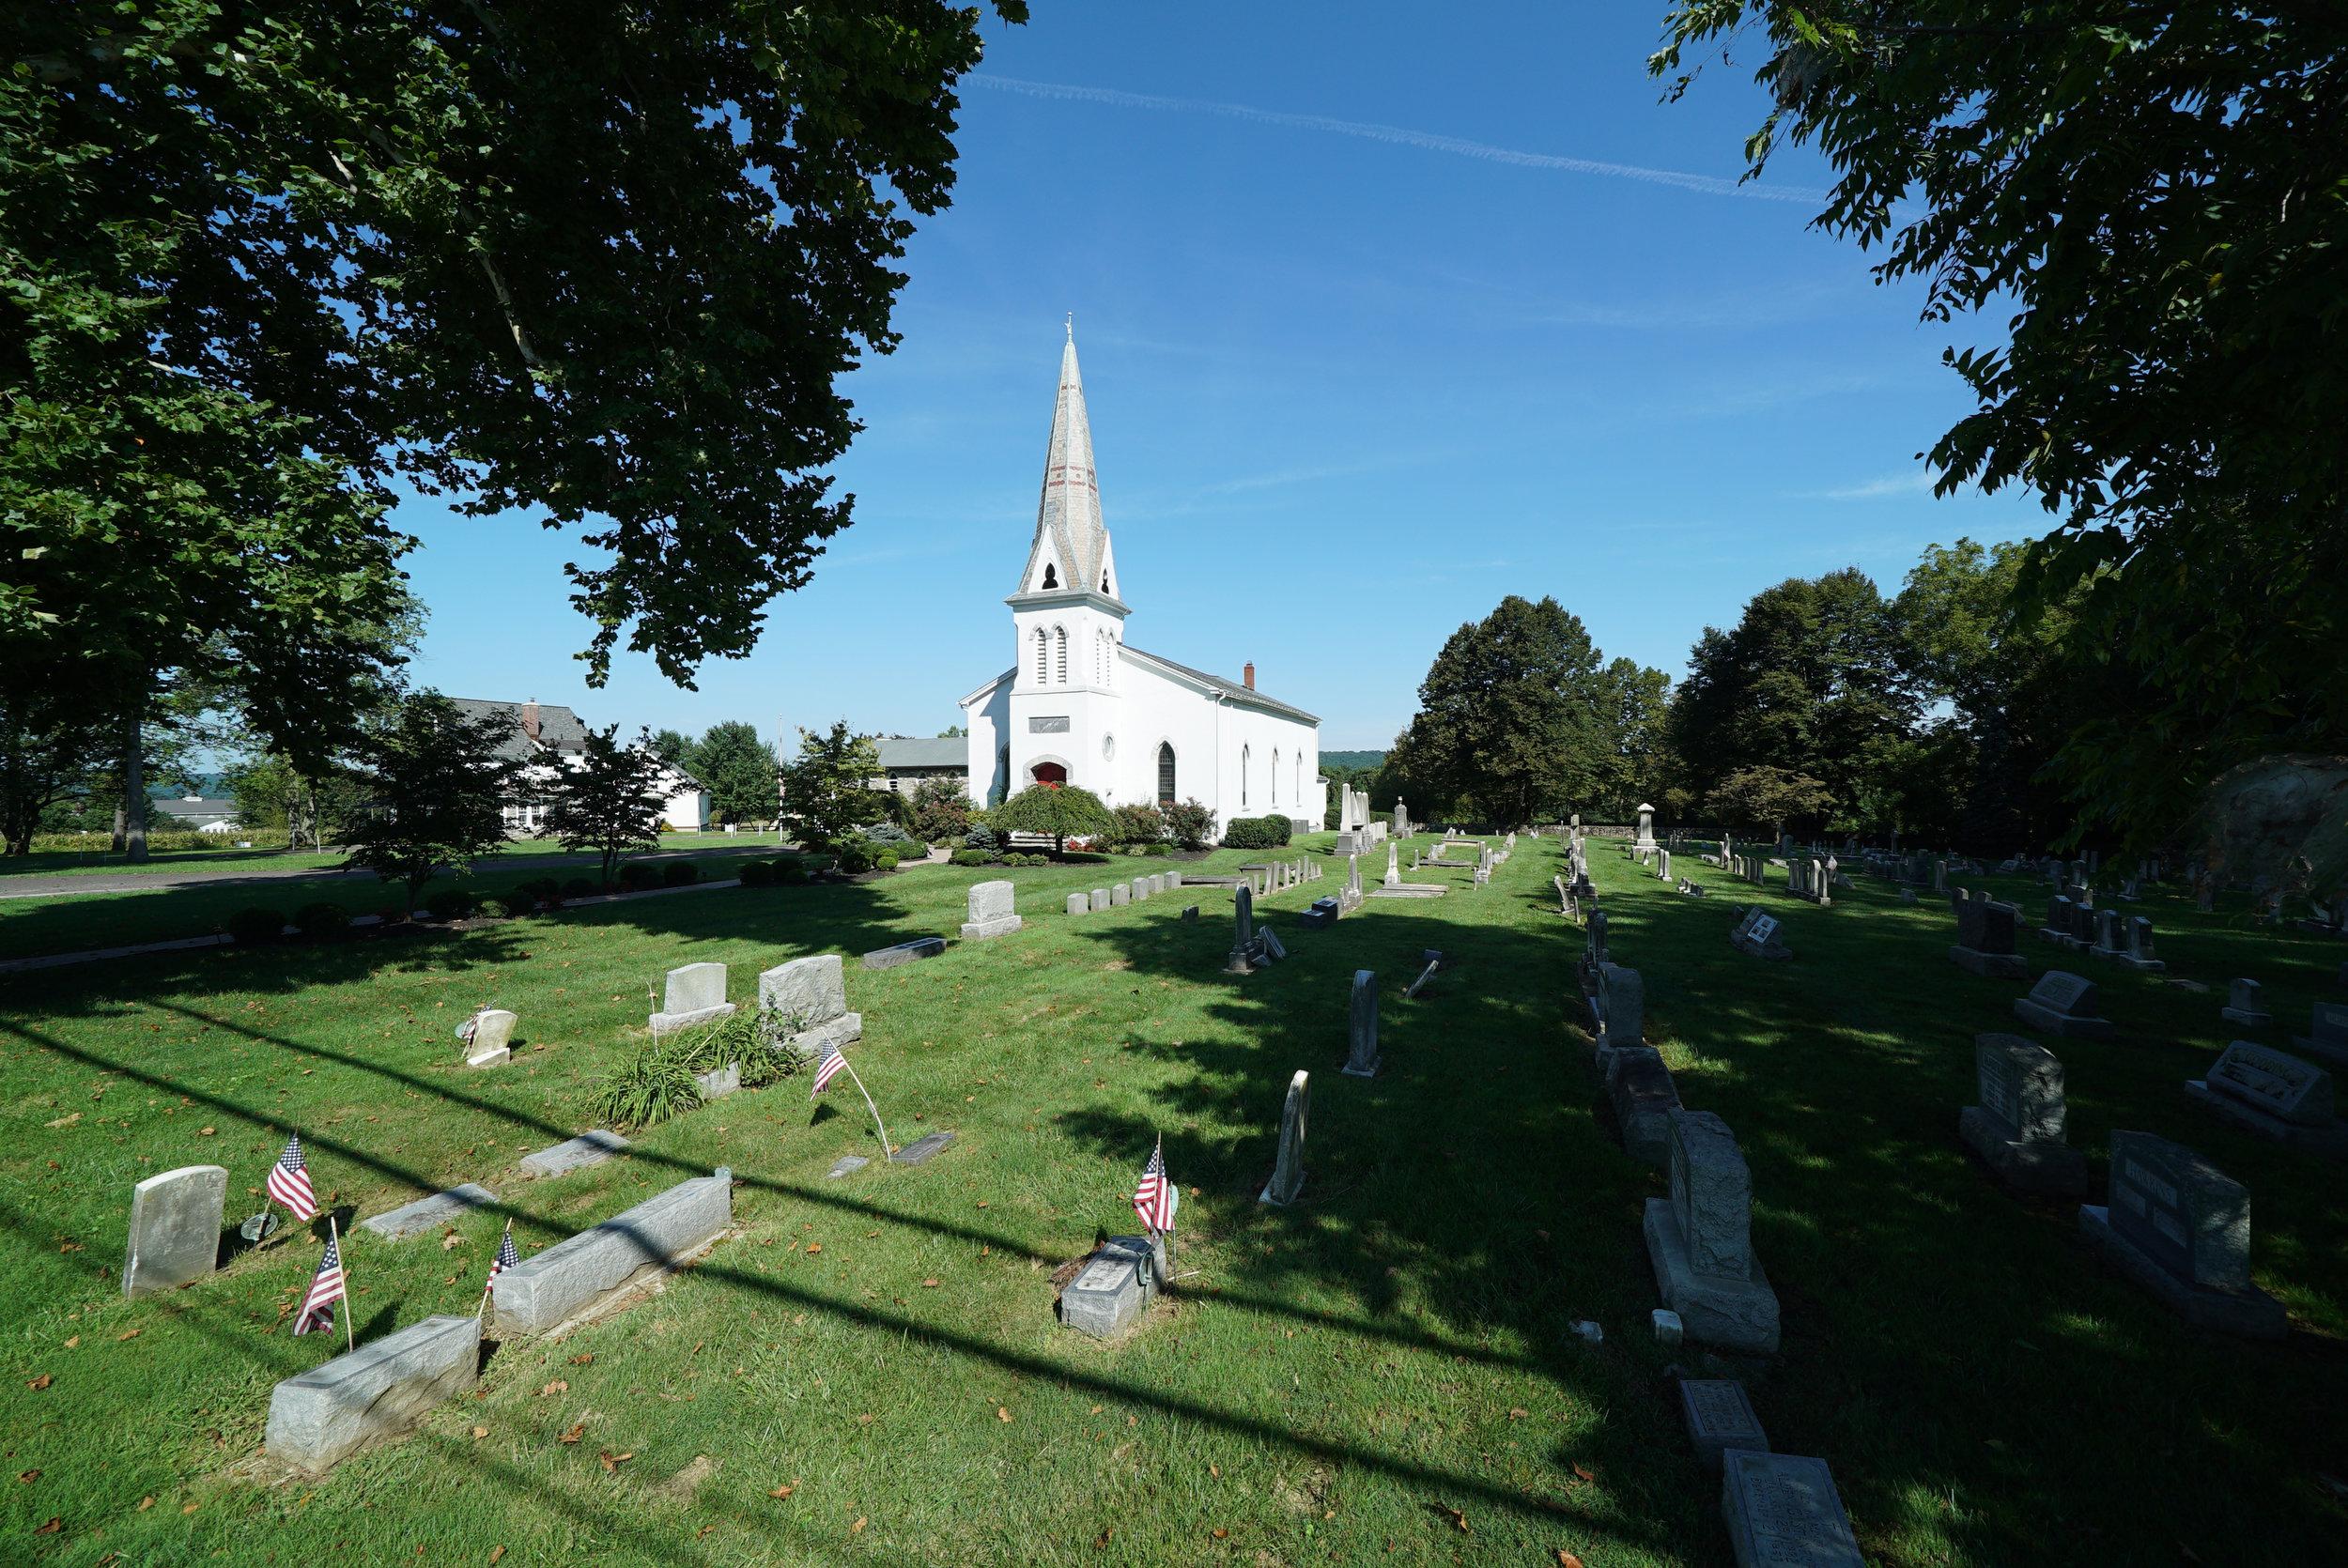 st pauls episcopal church cemetery exton pa2.jpg